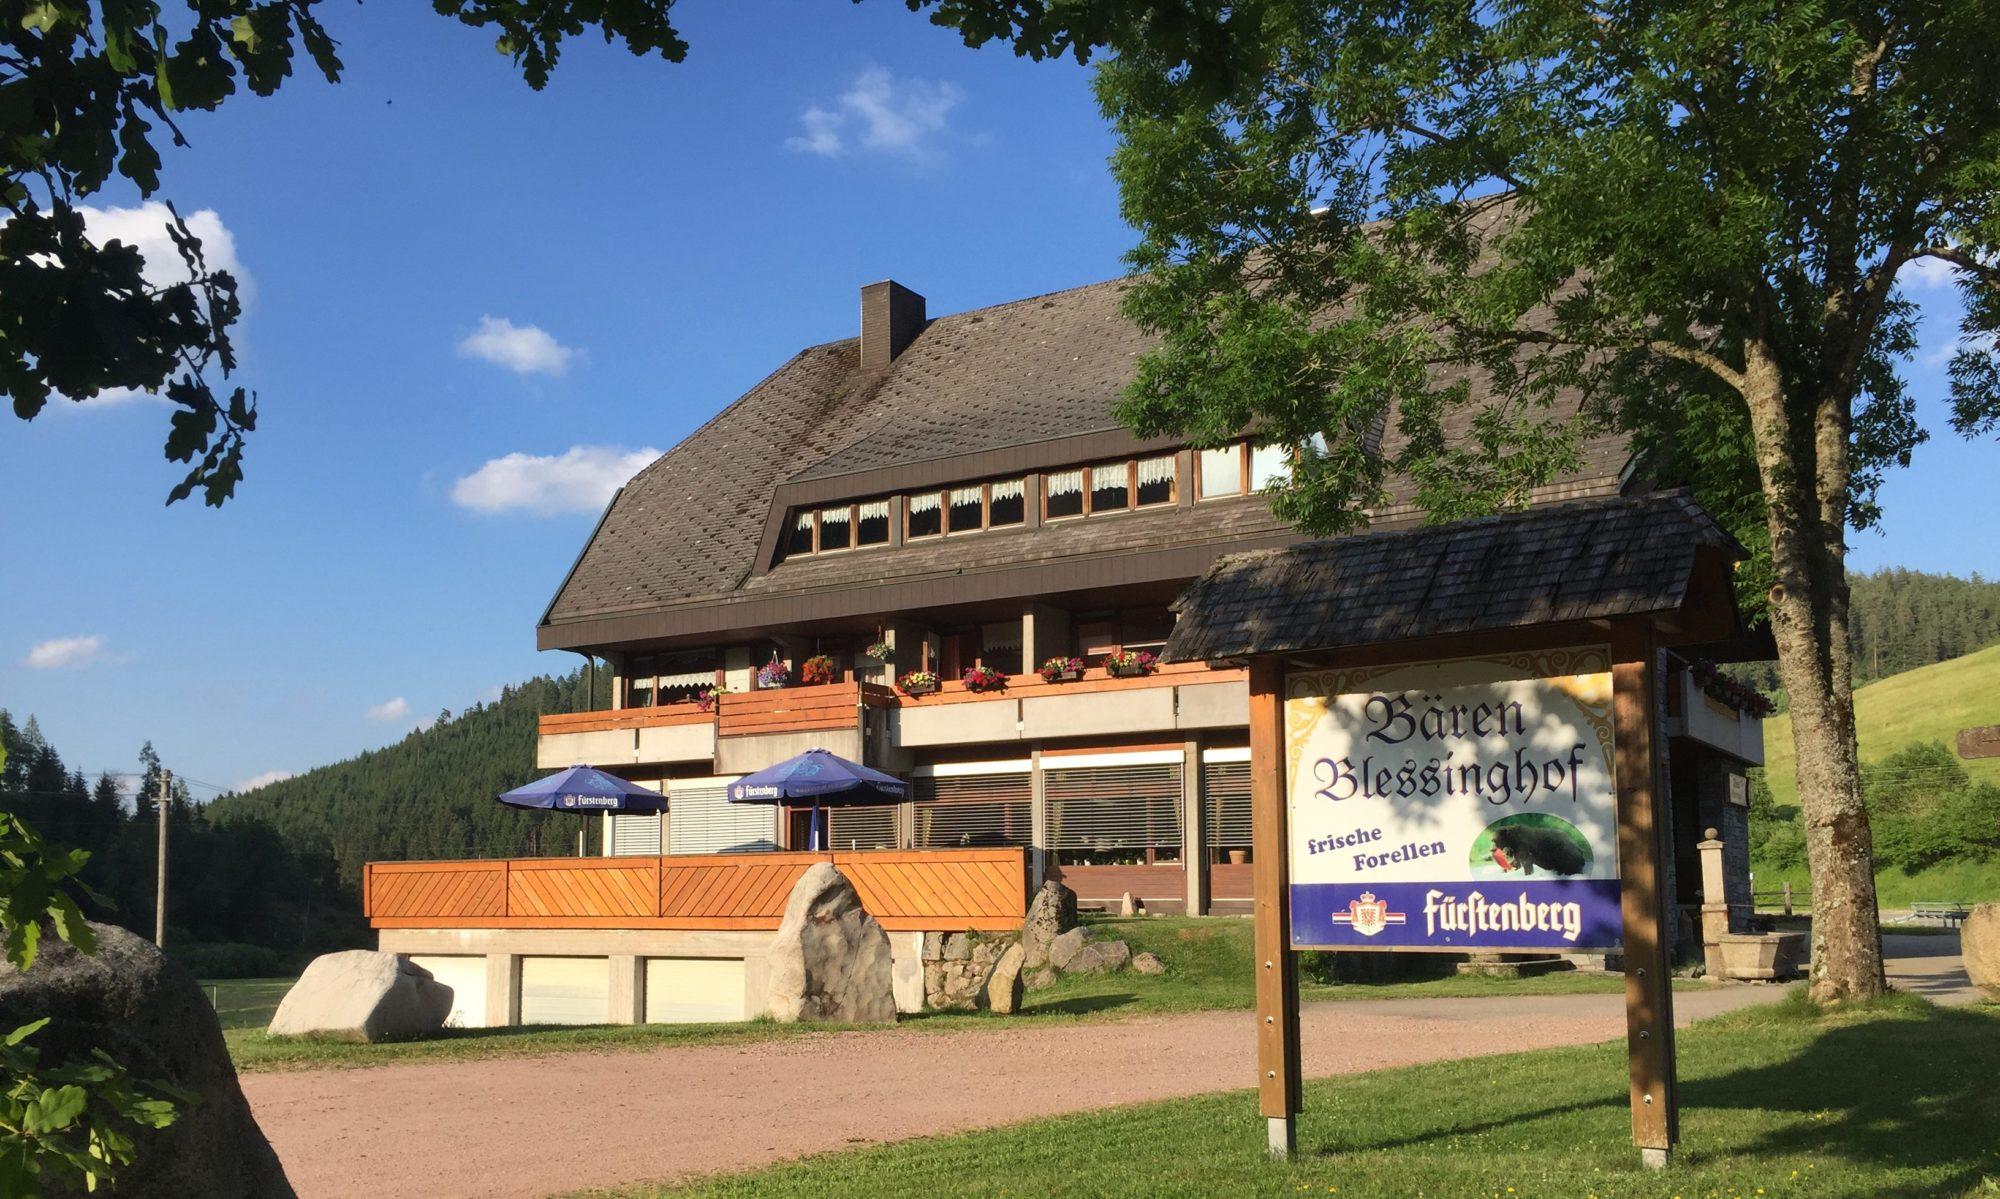 Gasthaus Bären-Blessinghof